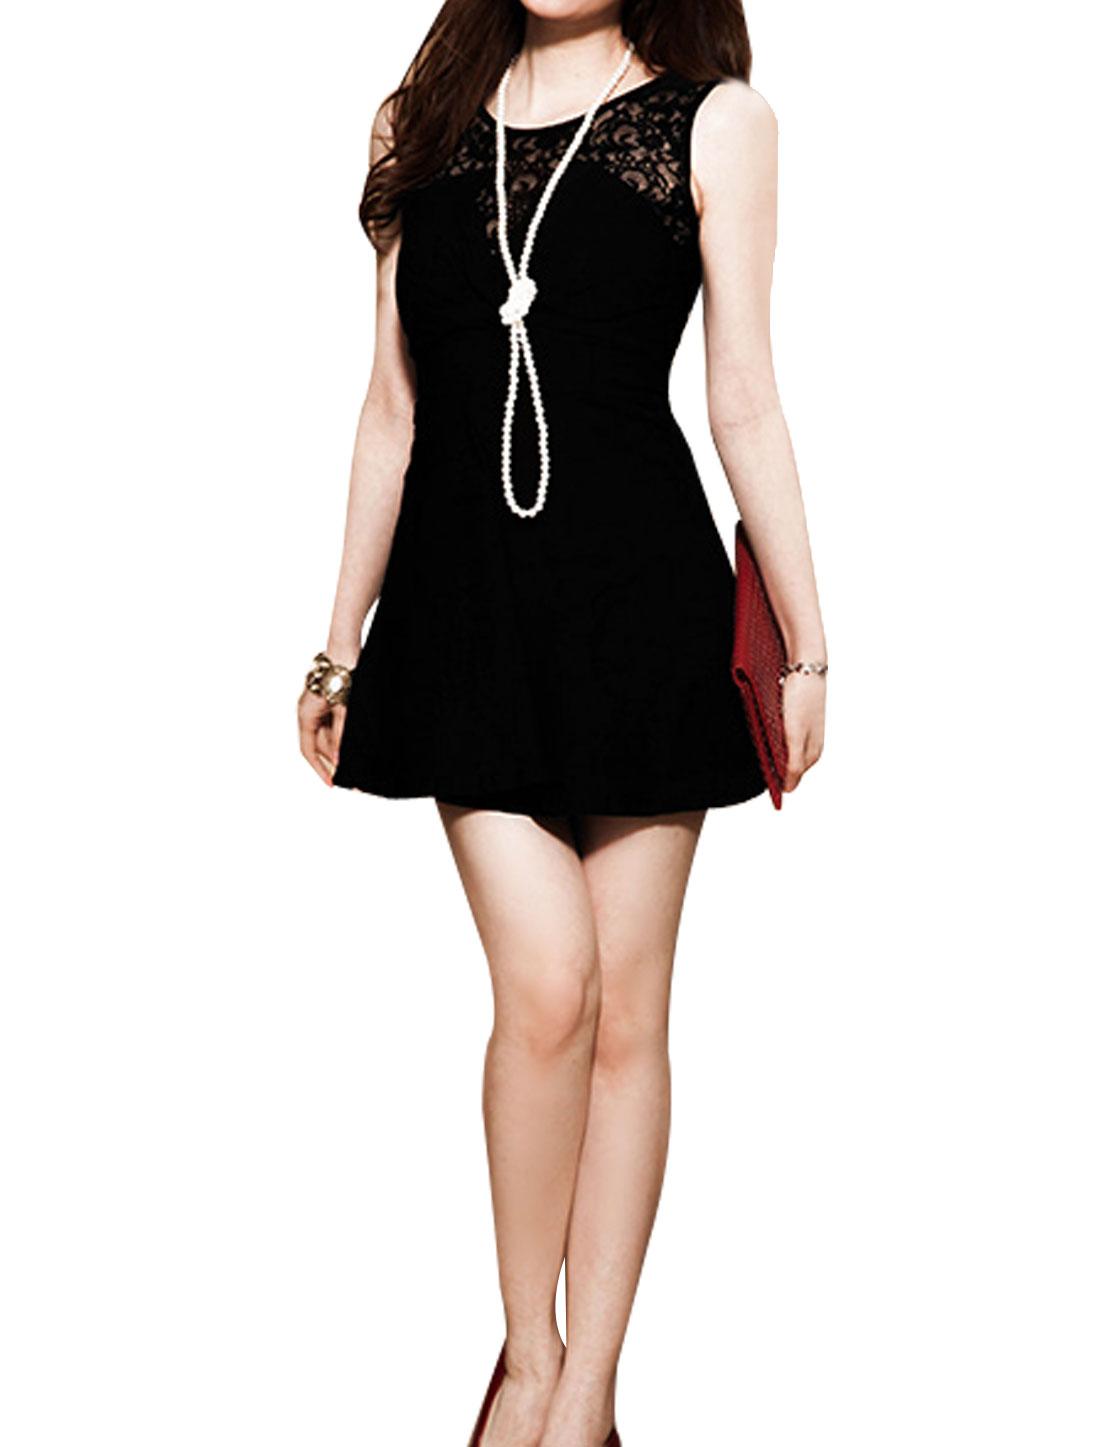 Round Neck Hidden Back Zip Lace Splice Mini A-Line Dress Black XS for Women